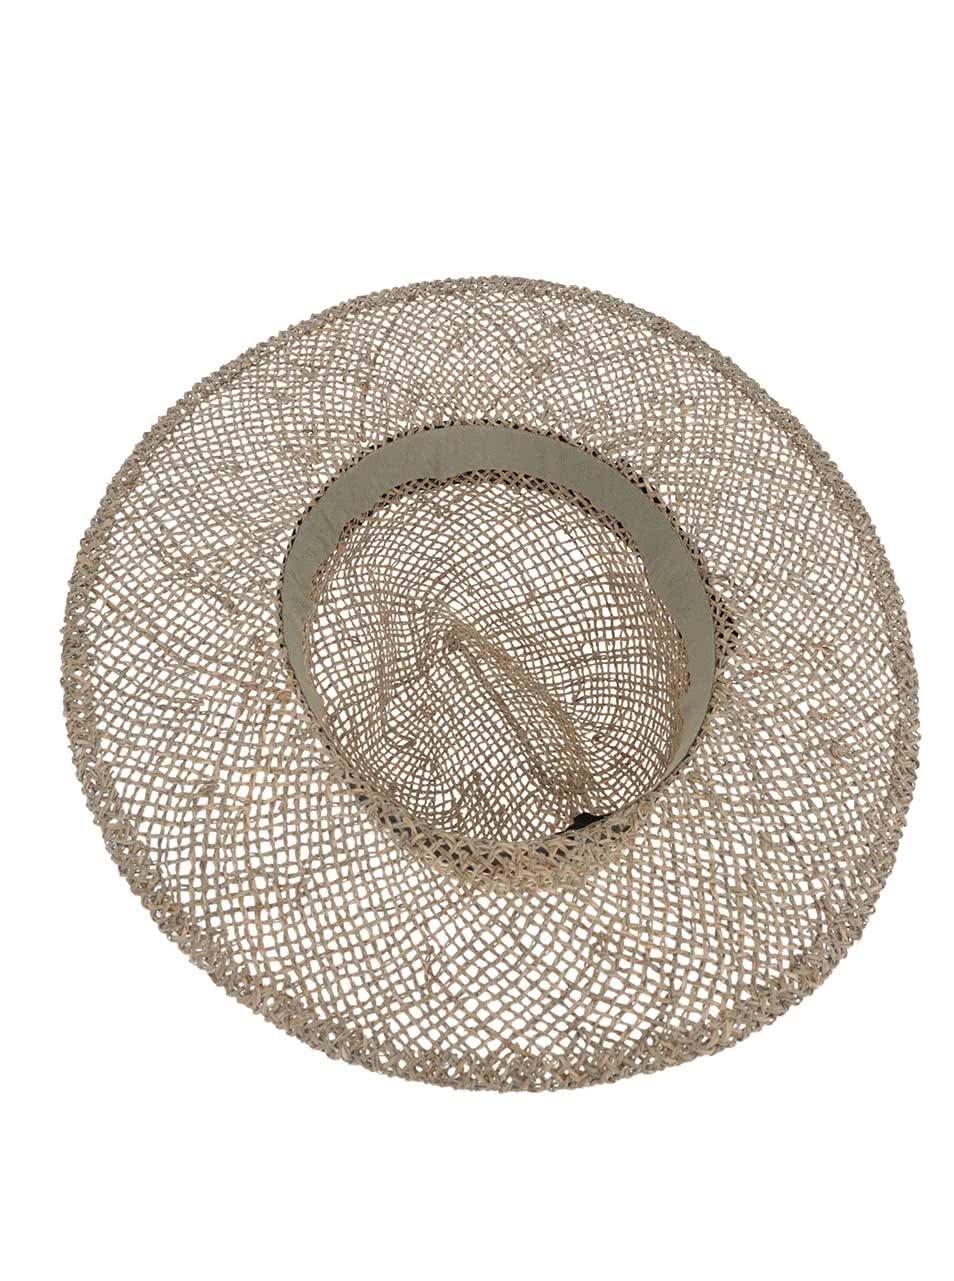 e45aae1dcf5 Slaměný klobouk s černou mašlí VERO MODA Ellen ...